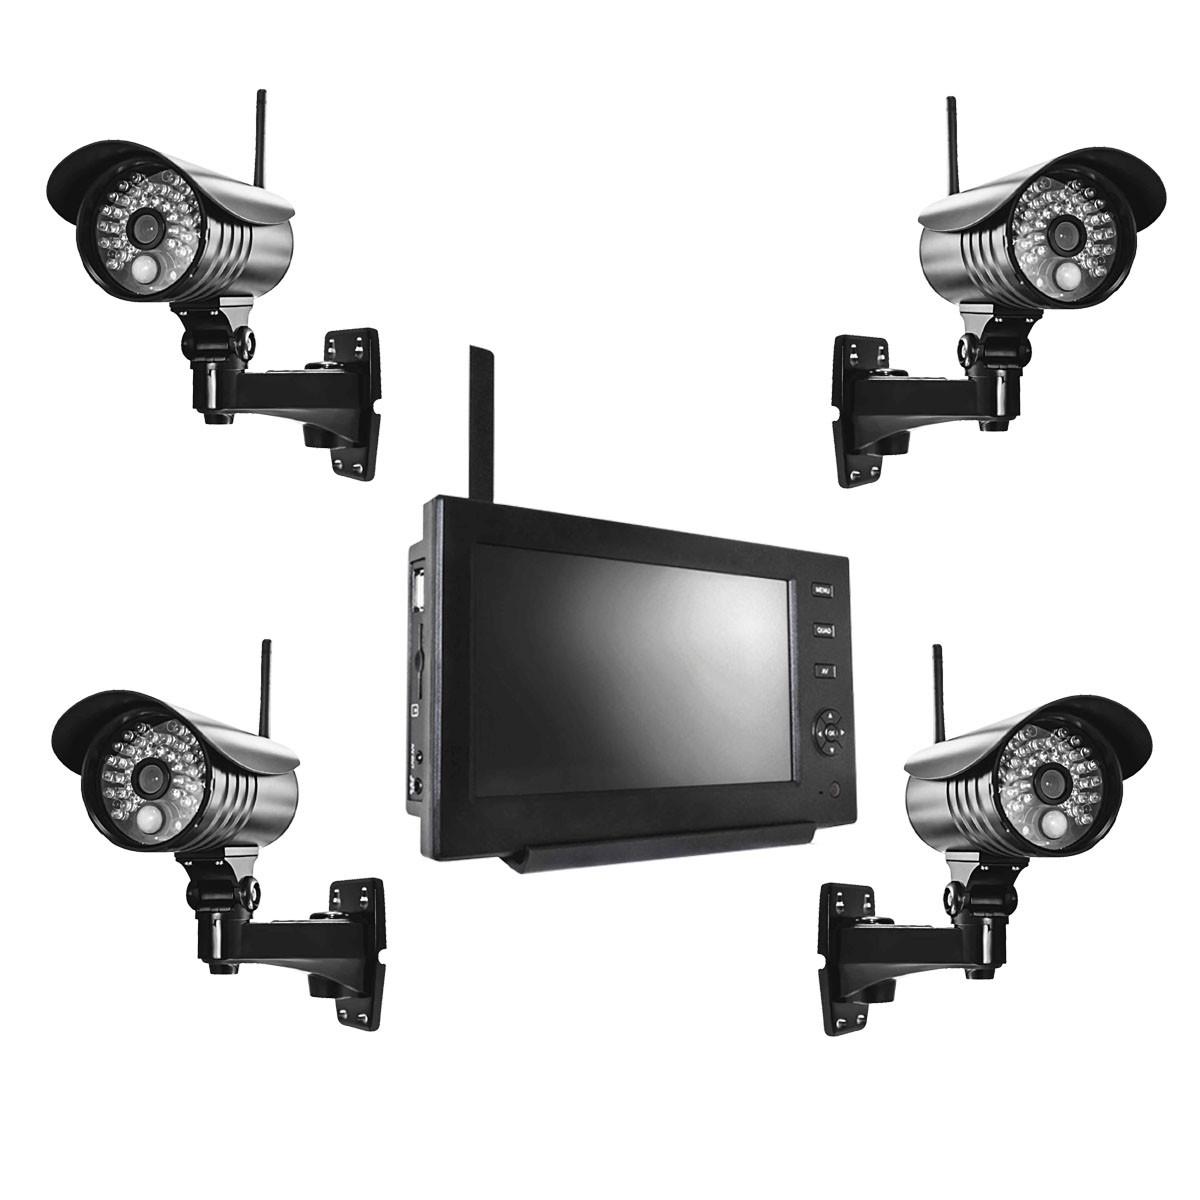 funk video berwachungssystem set 4x kamera 1x monitor video berwachung system ebay. Black Bedroom Furniture Sets. Home Design Ideas